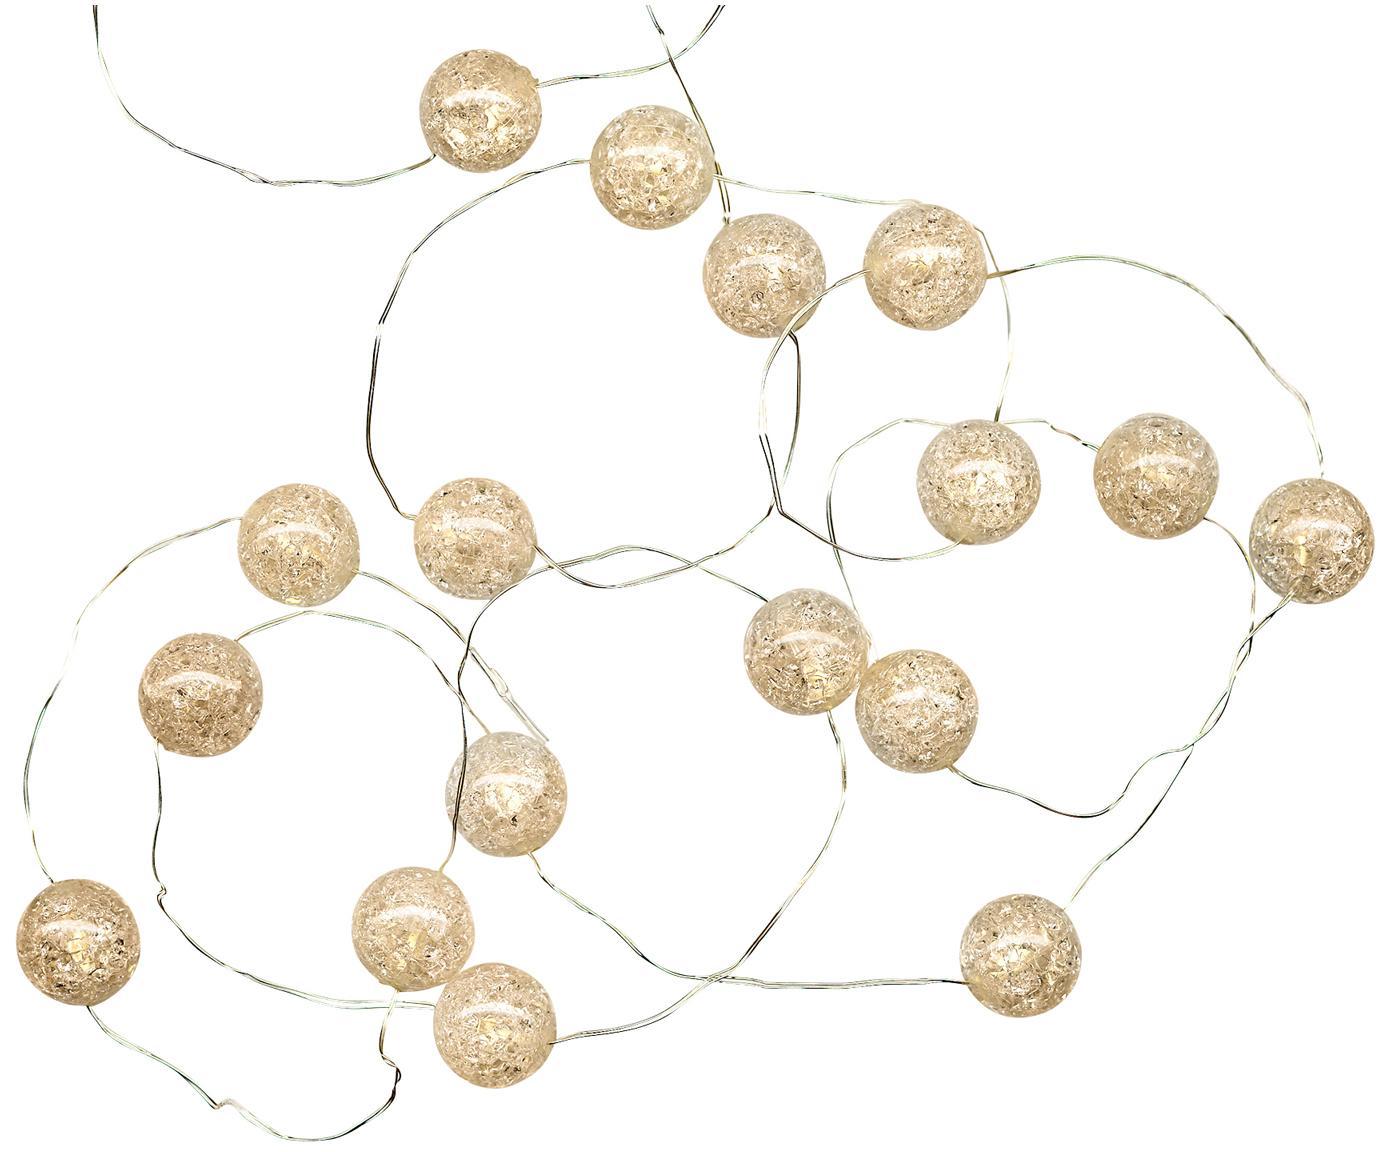 LED Lichterkette Raindrop, 140 cm, Kunststoff, Weiß, L 140 cm